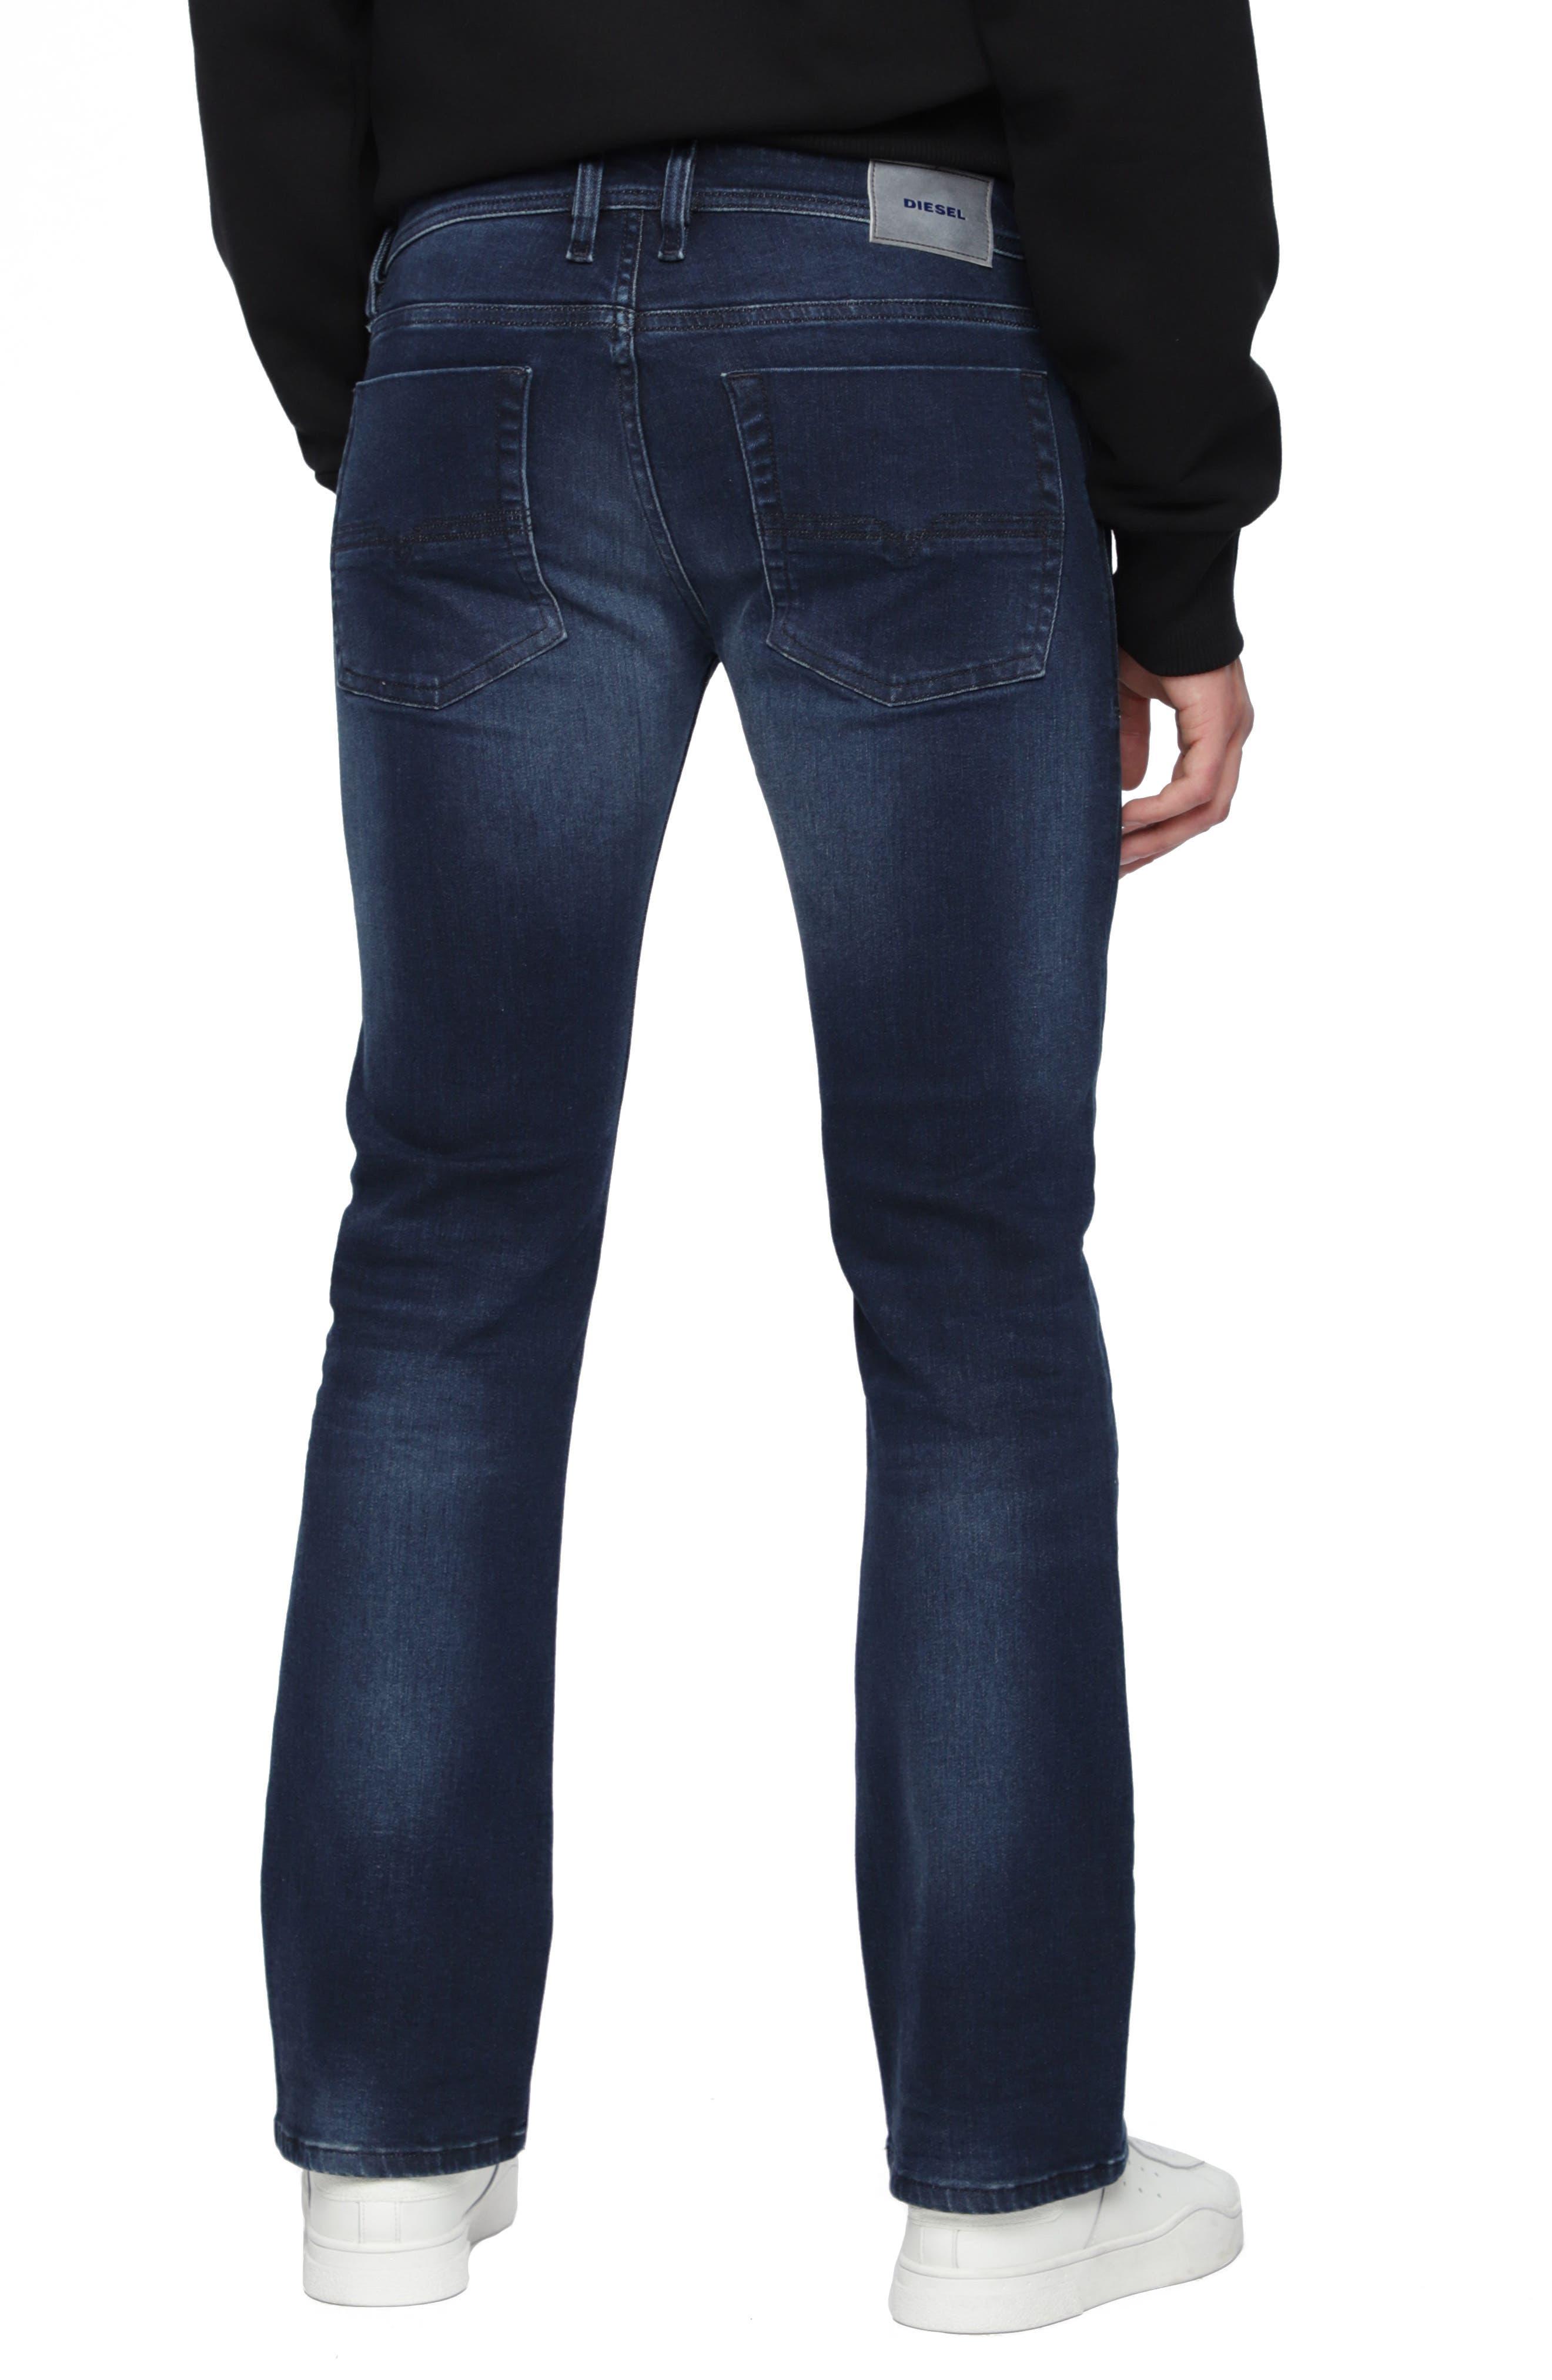 Zatiny Bootcut Jeans,                             Alternate thumbnail 2, color,                             C84vg